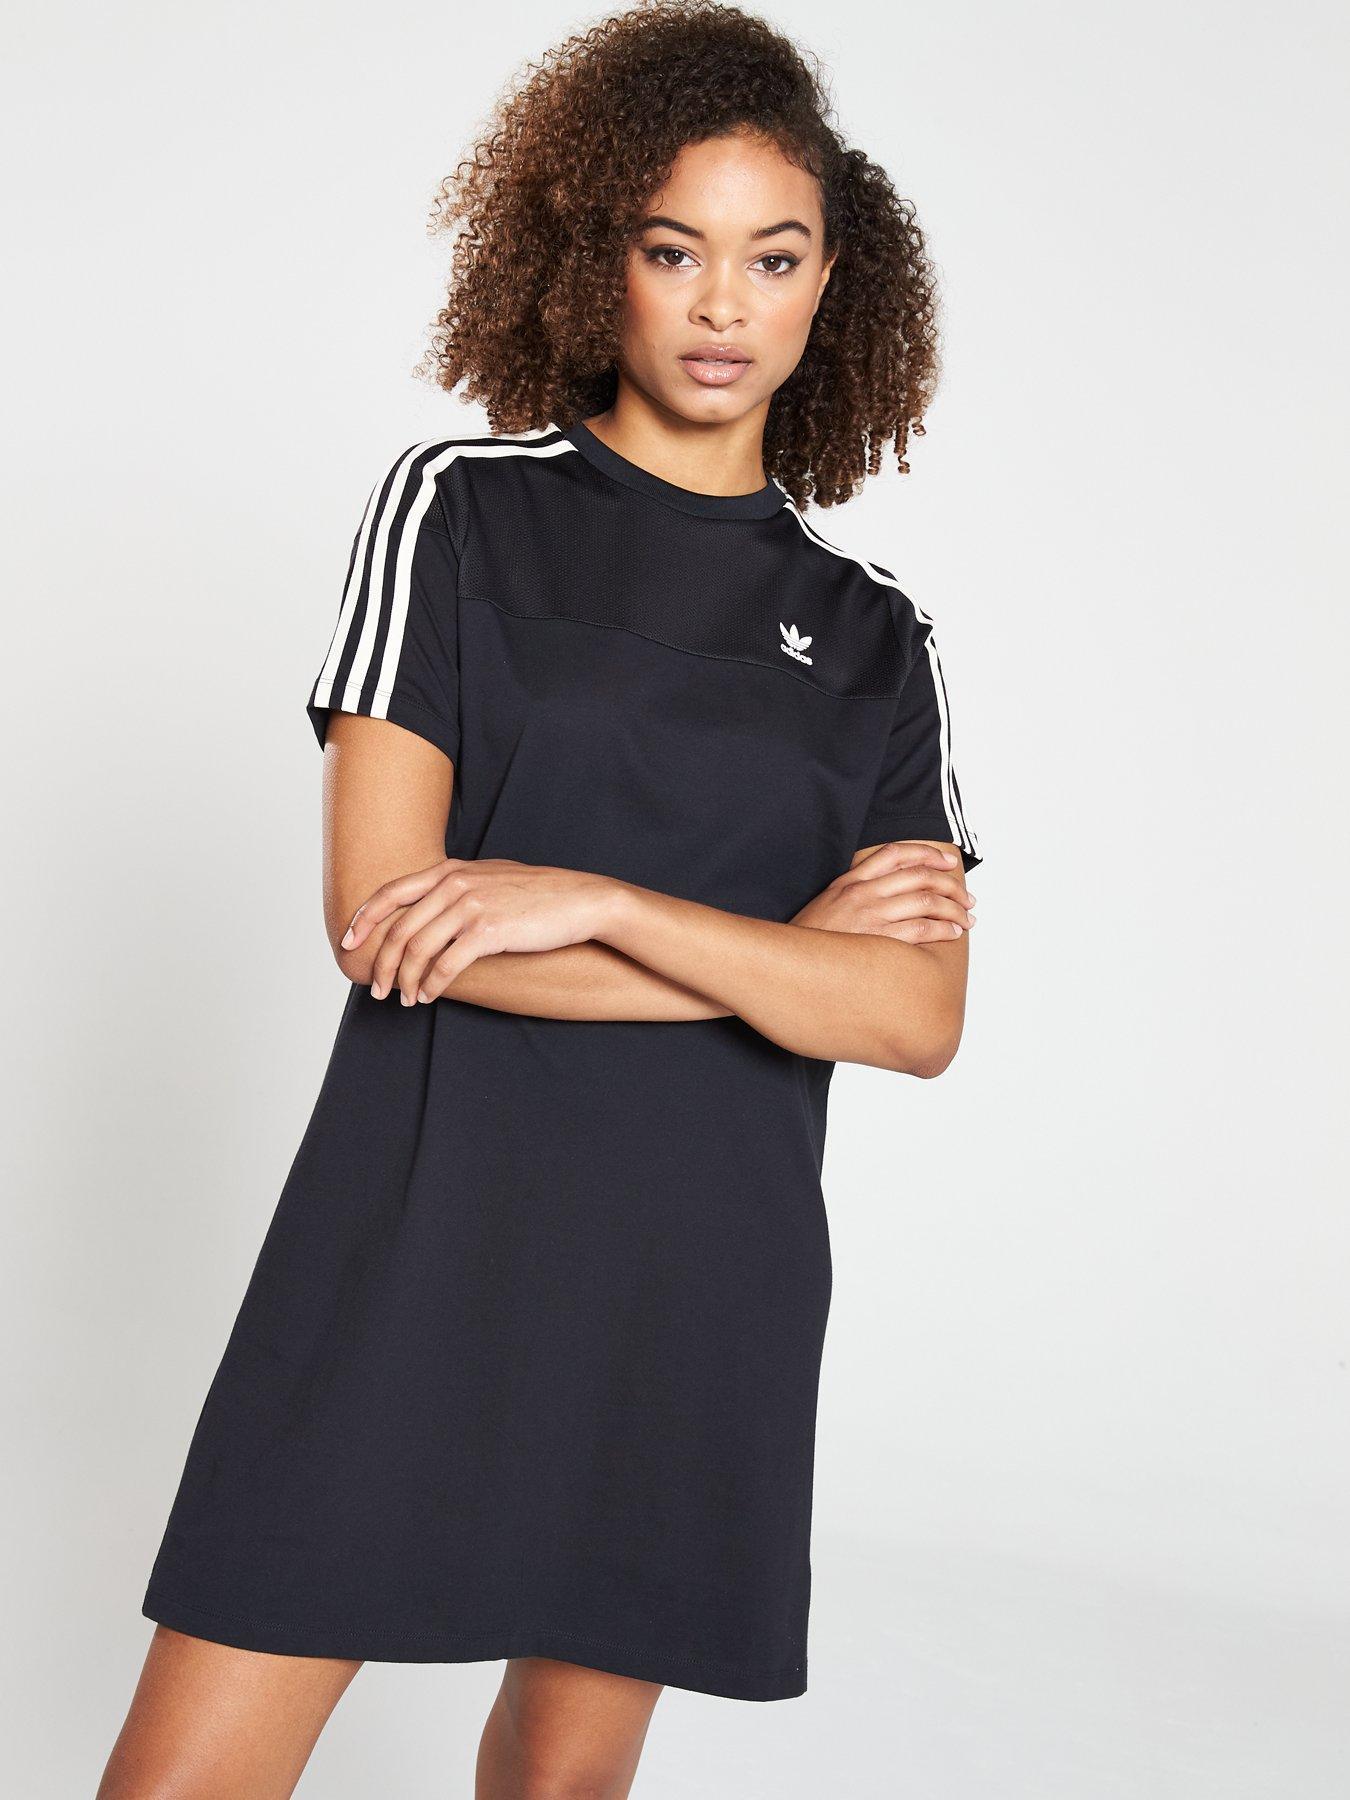 black dress adidas